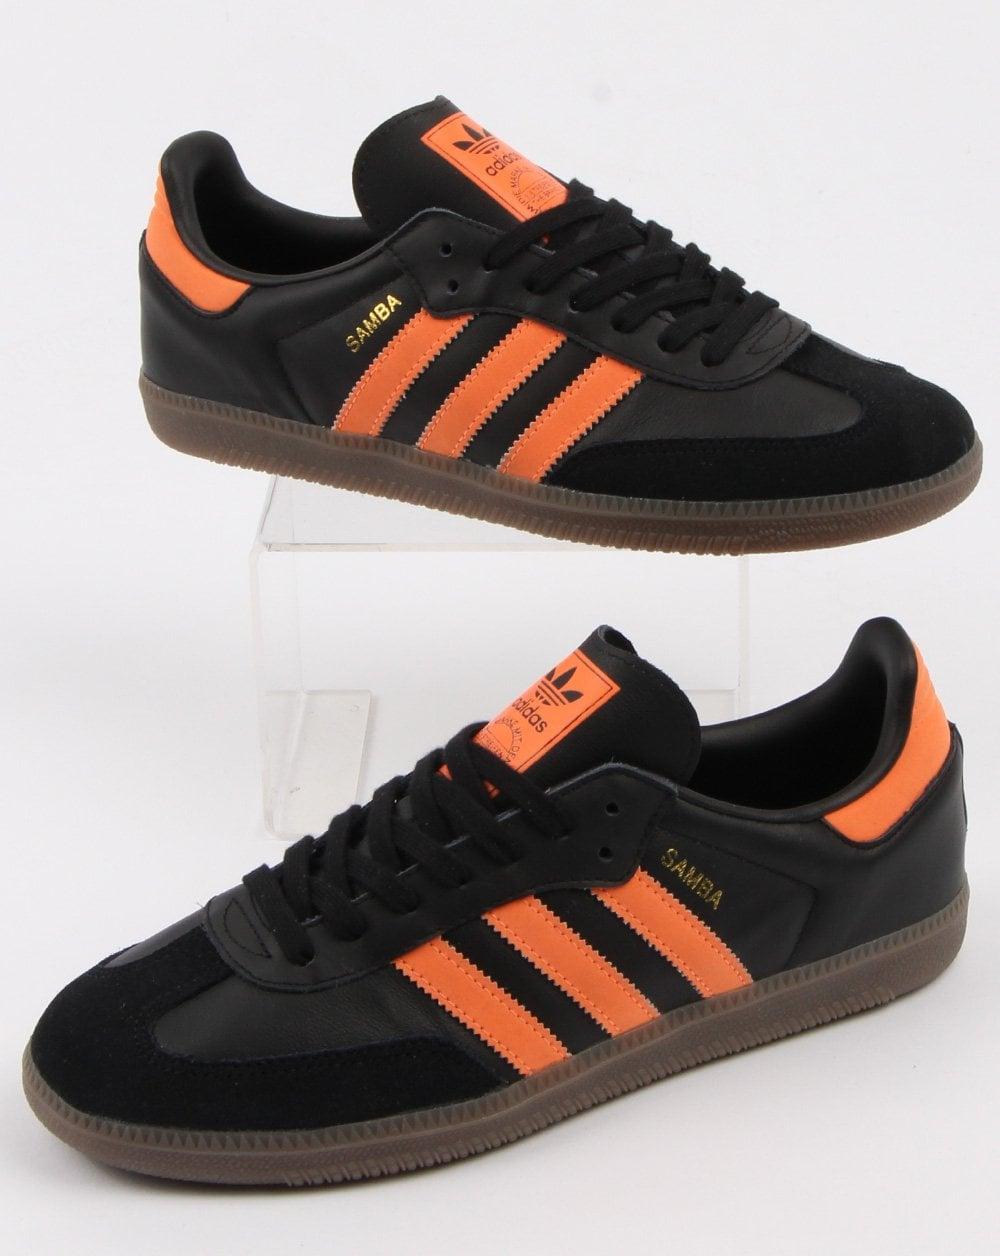 f9efc2e77 Adidas Samba, Black, Og Trainers, Orange,Mens, Leather, Originals